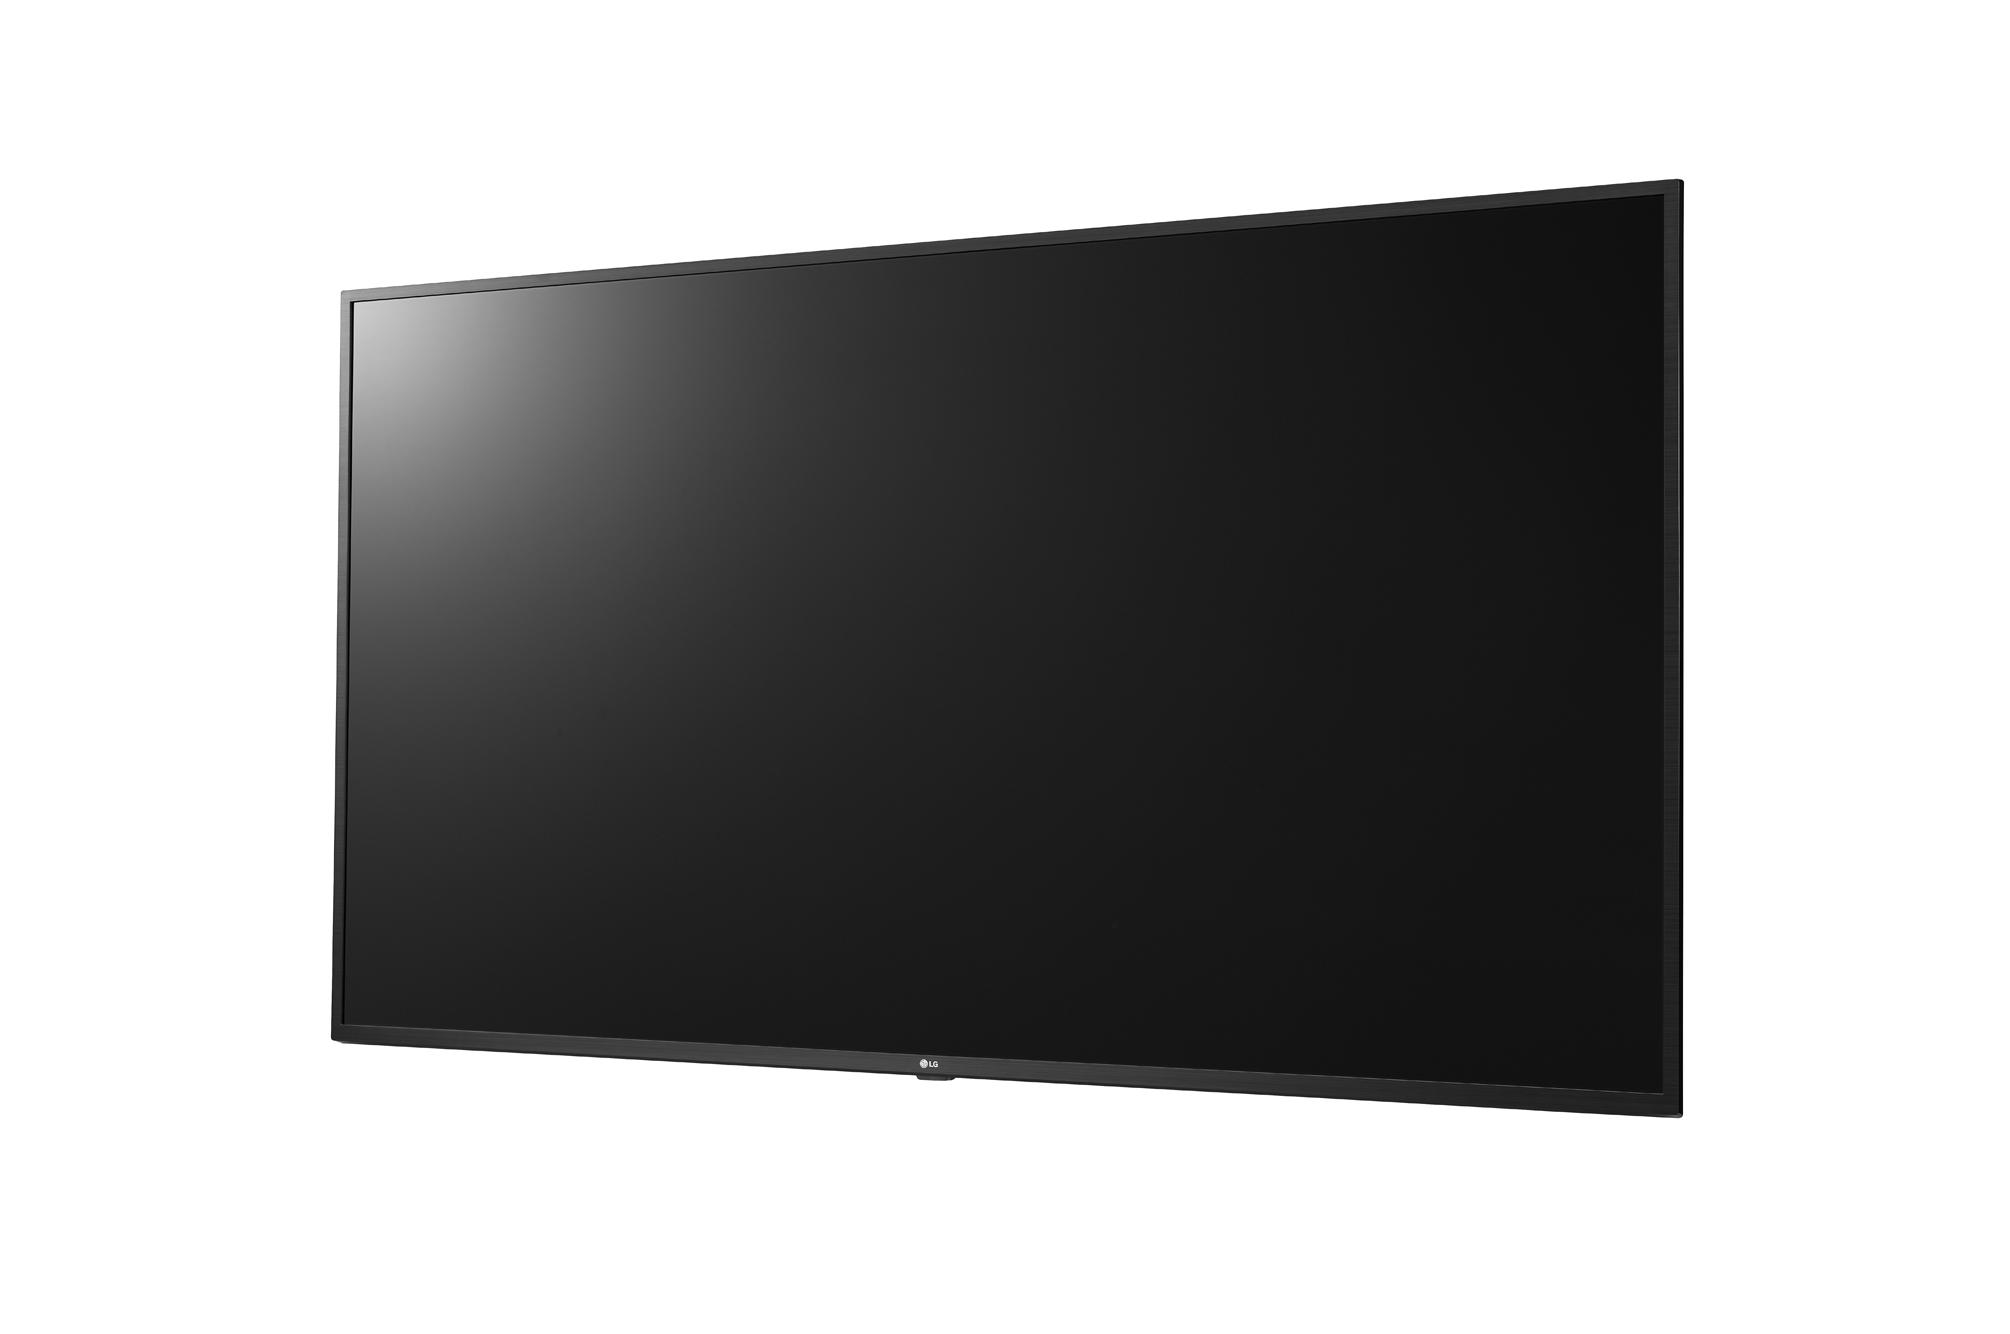 LG Smart TV Signage 65UT640S (ASIA) 3